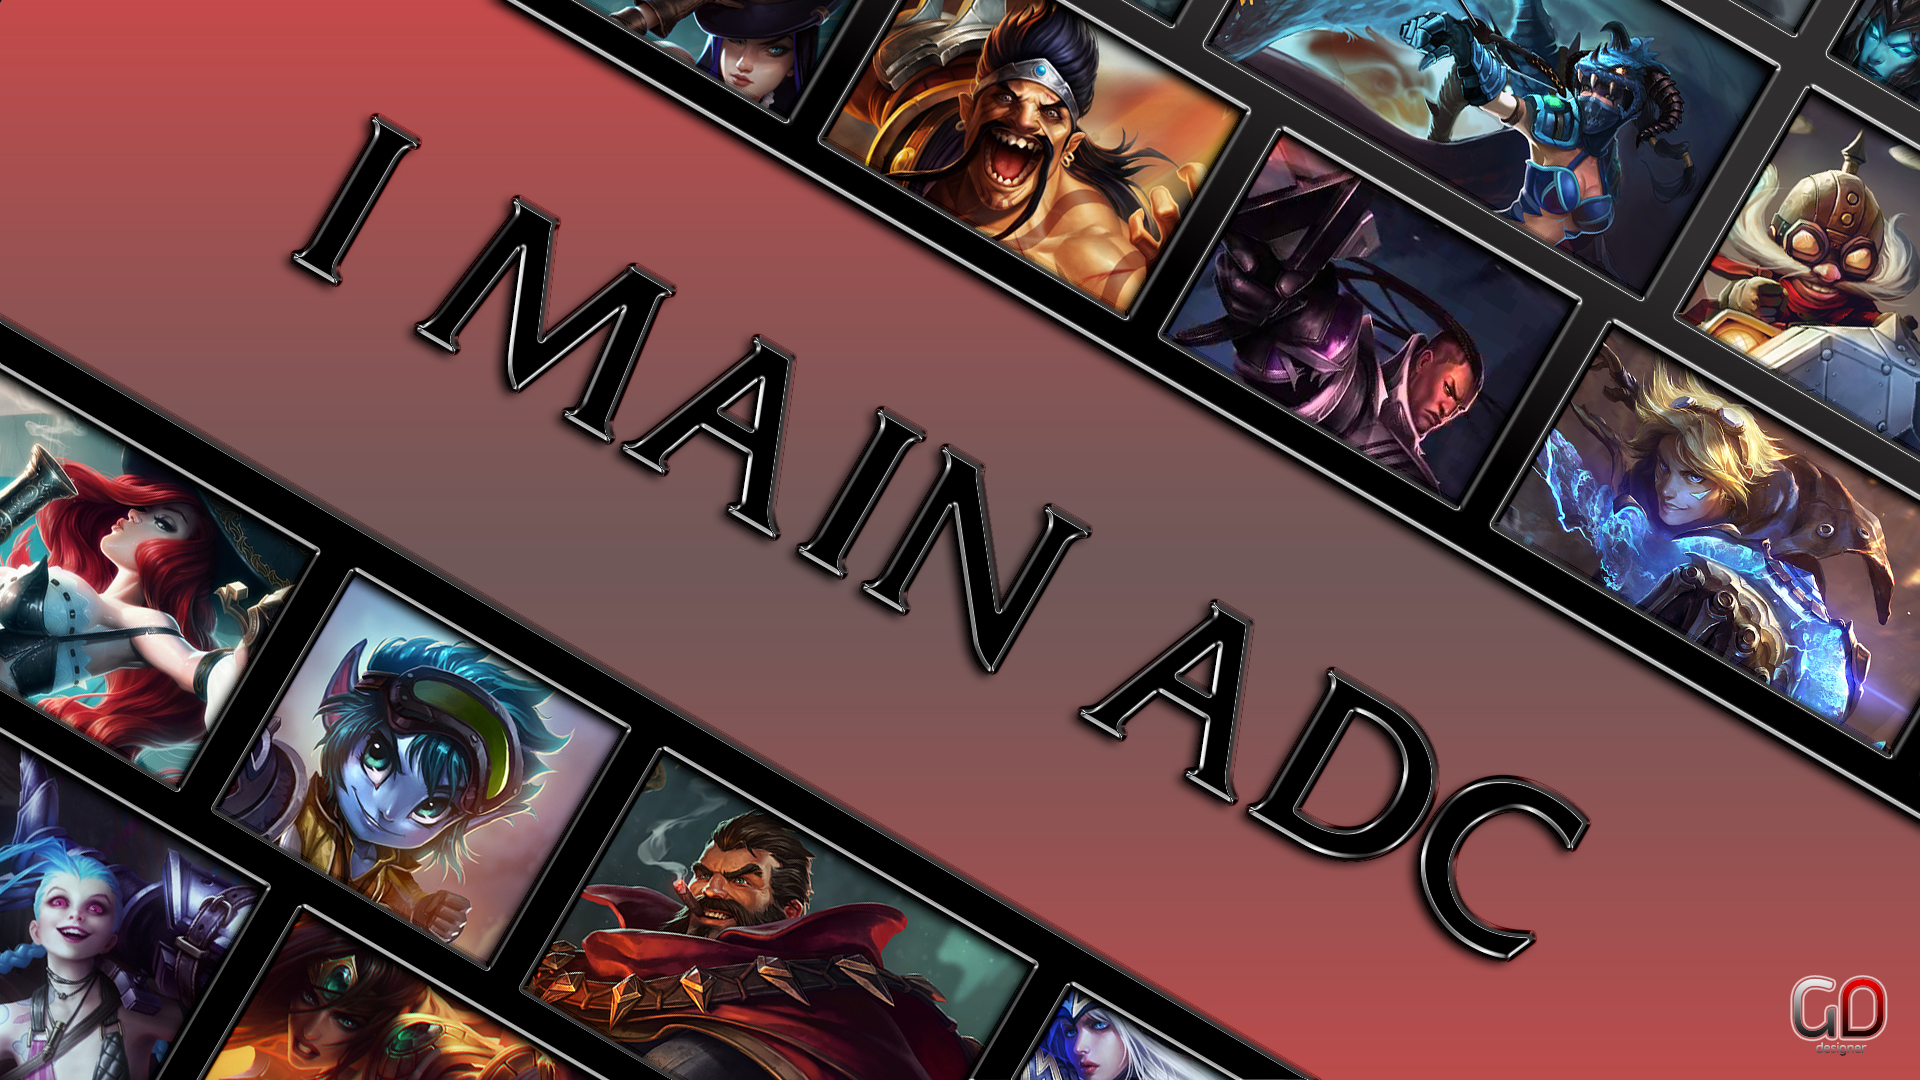 47 League Of Legends Adc Wallpaper On Wallpapersafari